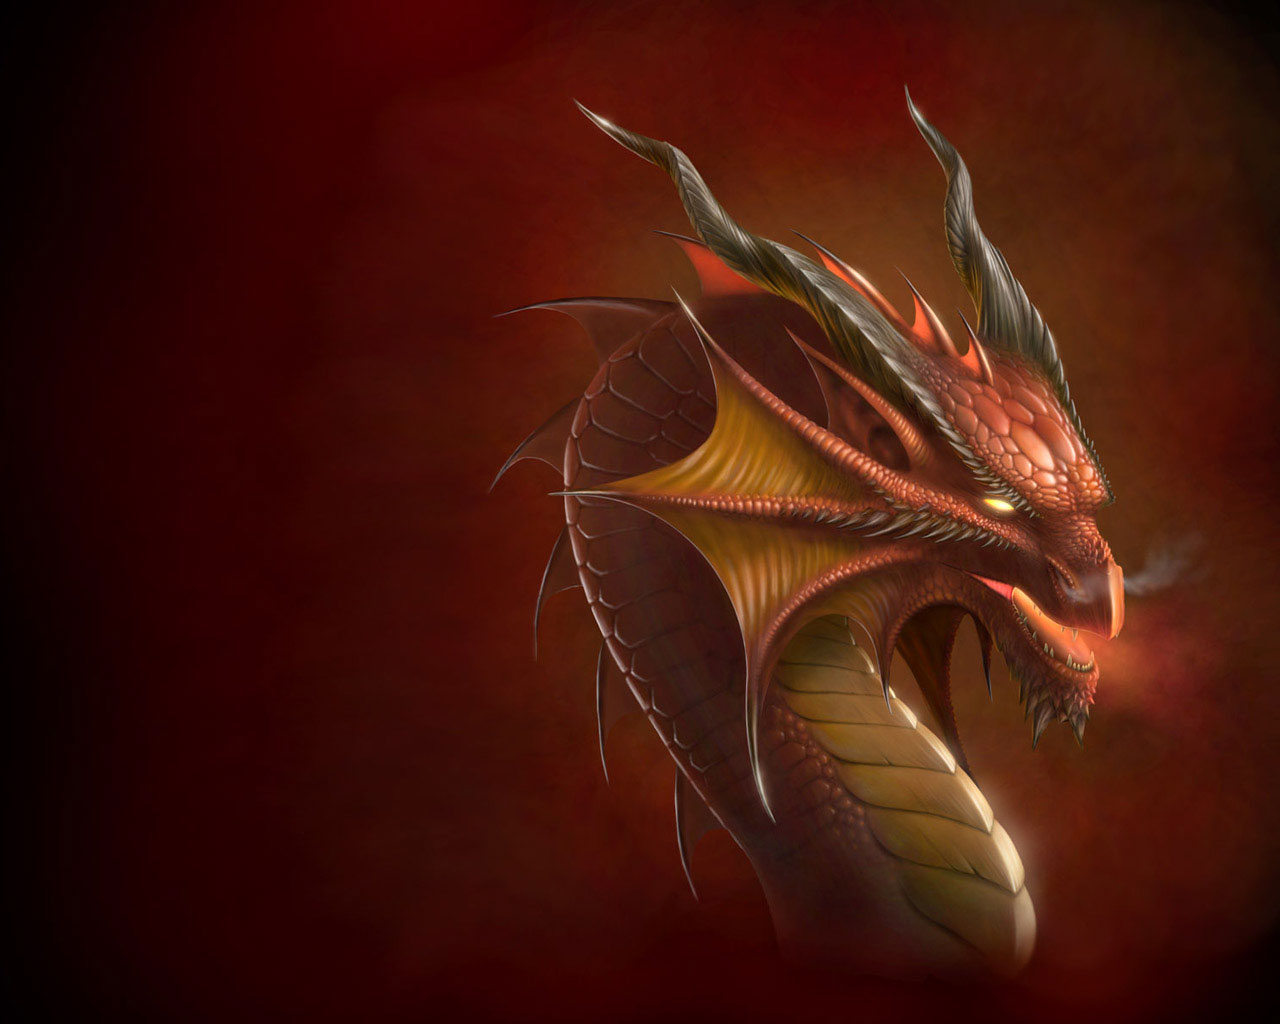 http://img.desktopwallpapers.ru/fantasy/pics/dragon-head-1280.jpg